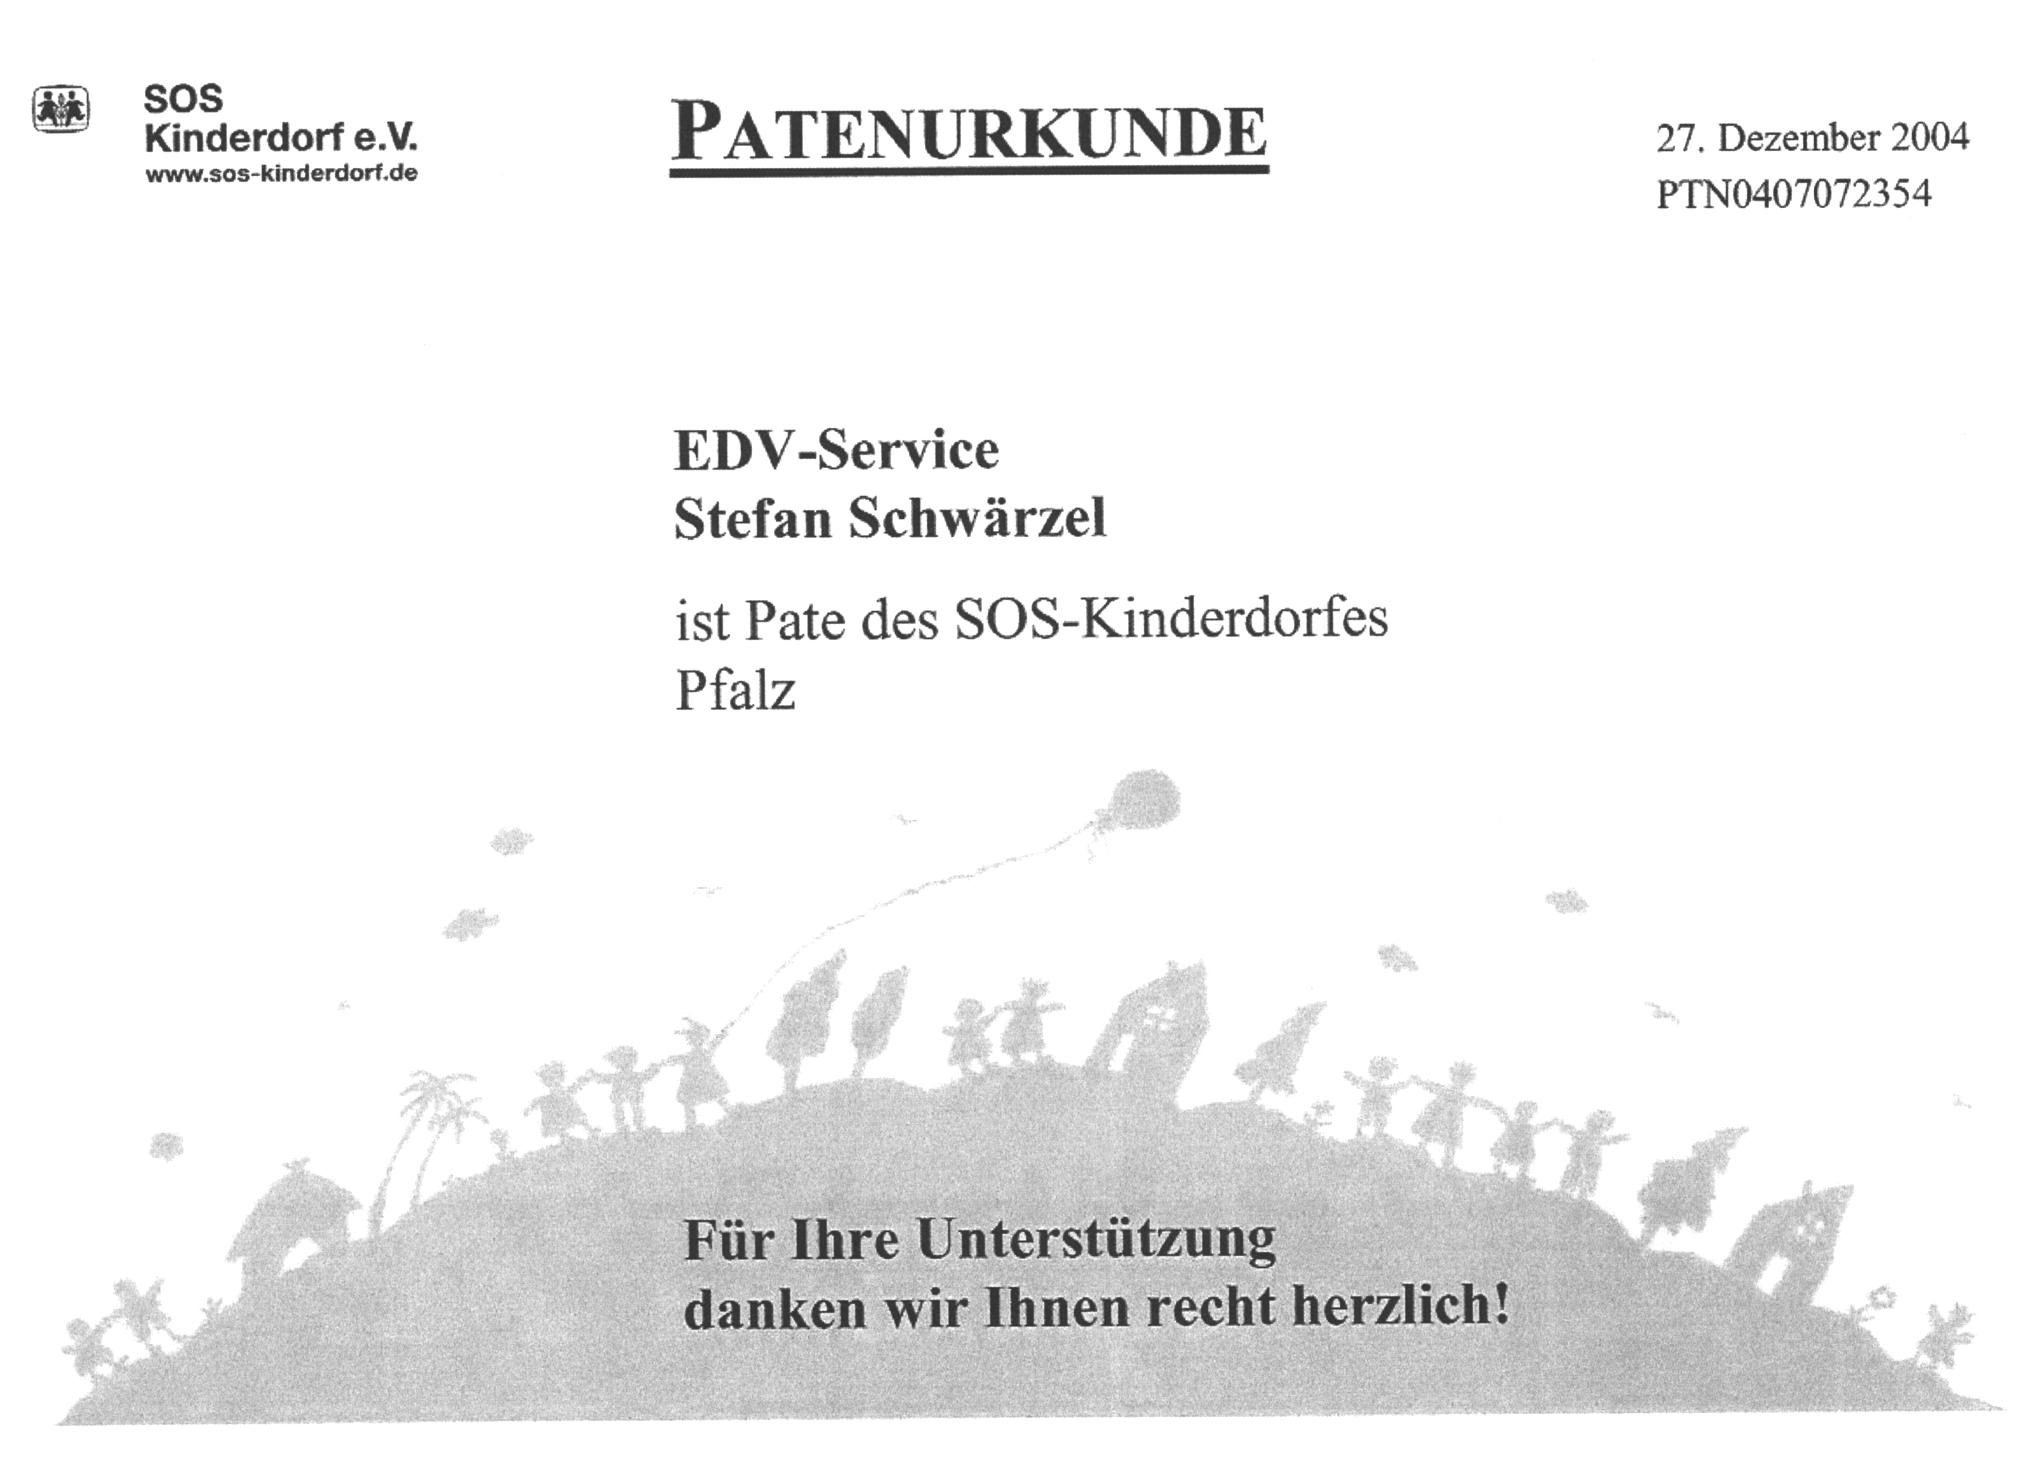 Patenurkunde SOS-Kinderdorf